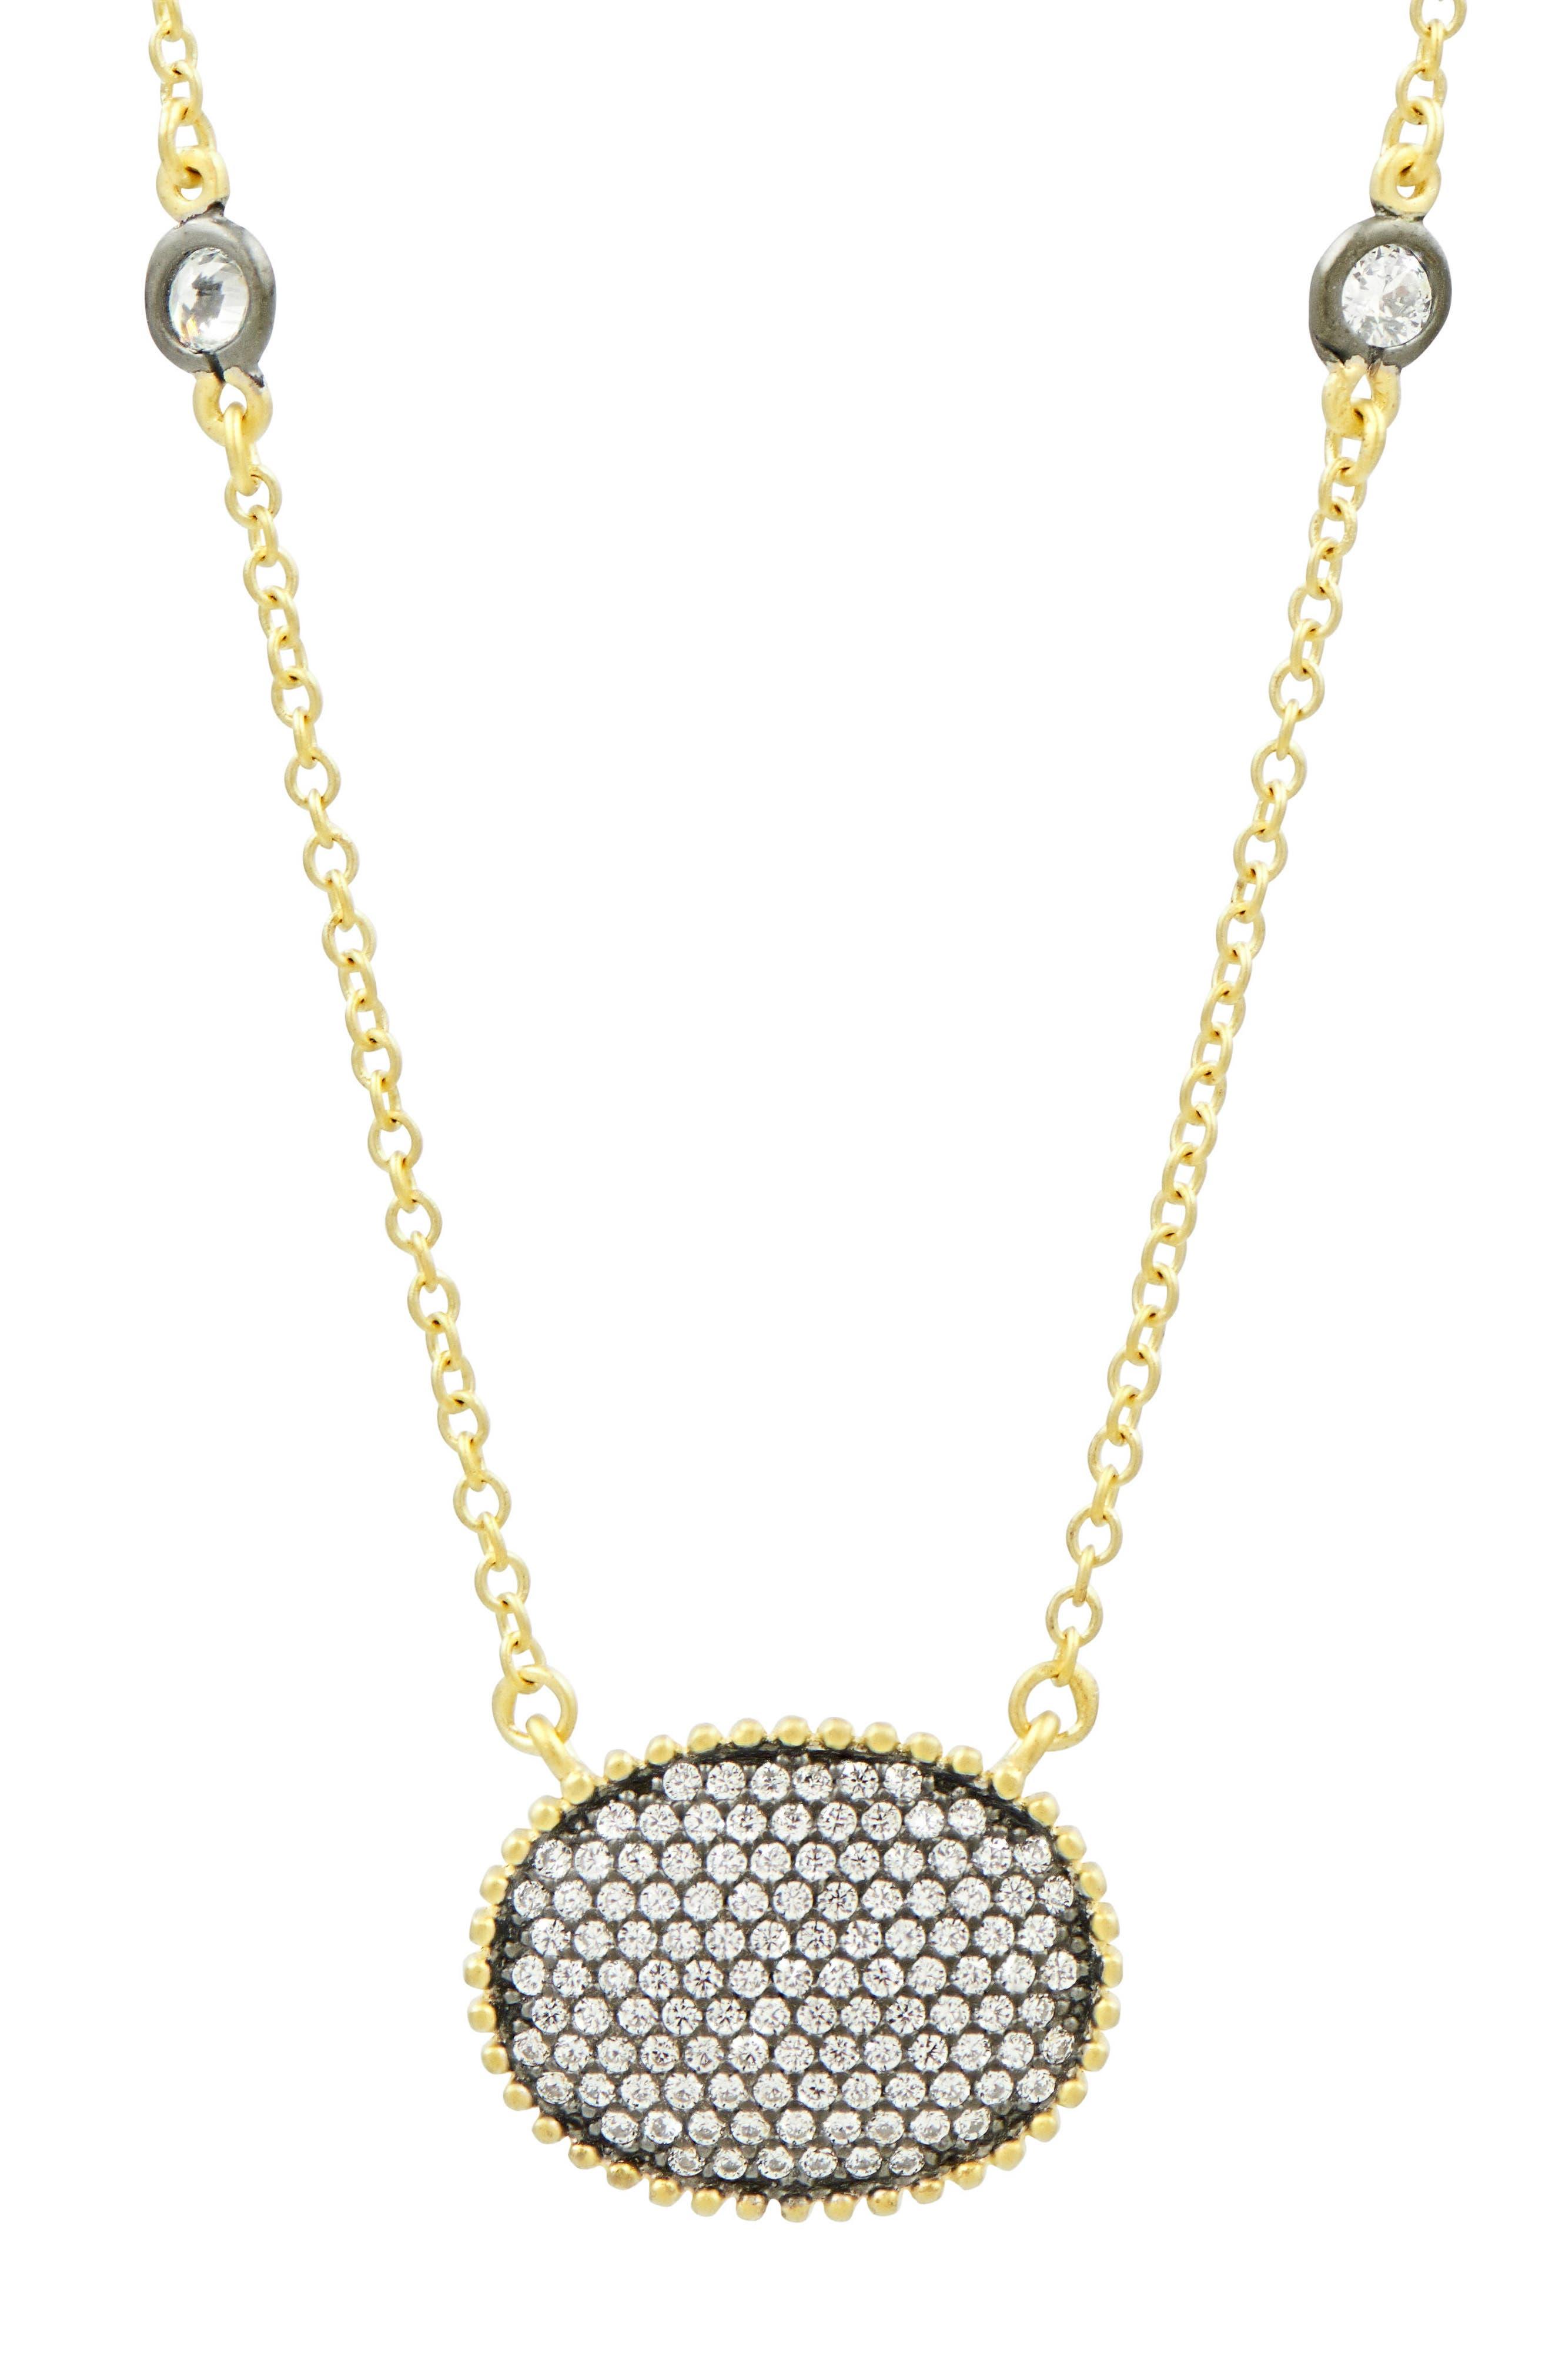 Oval Pendant Necklace,                         Main,                         color, Gold/ Black Rhodium